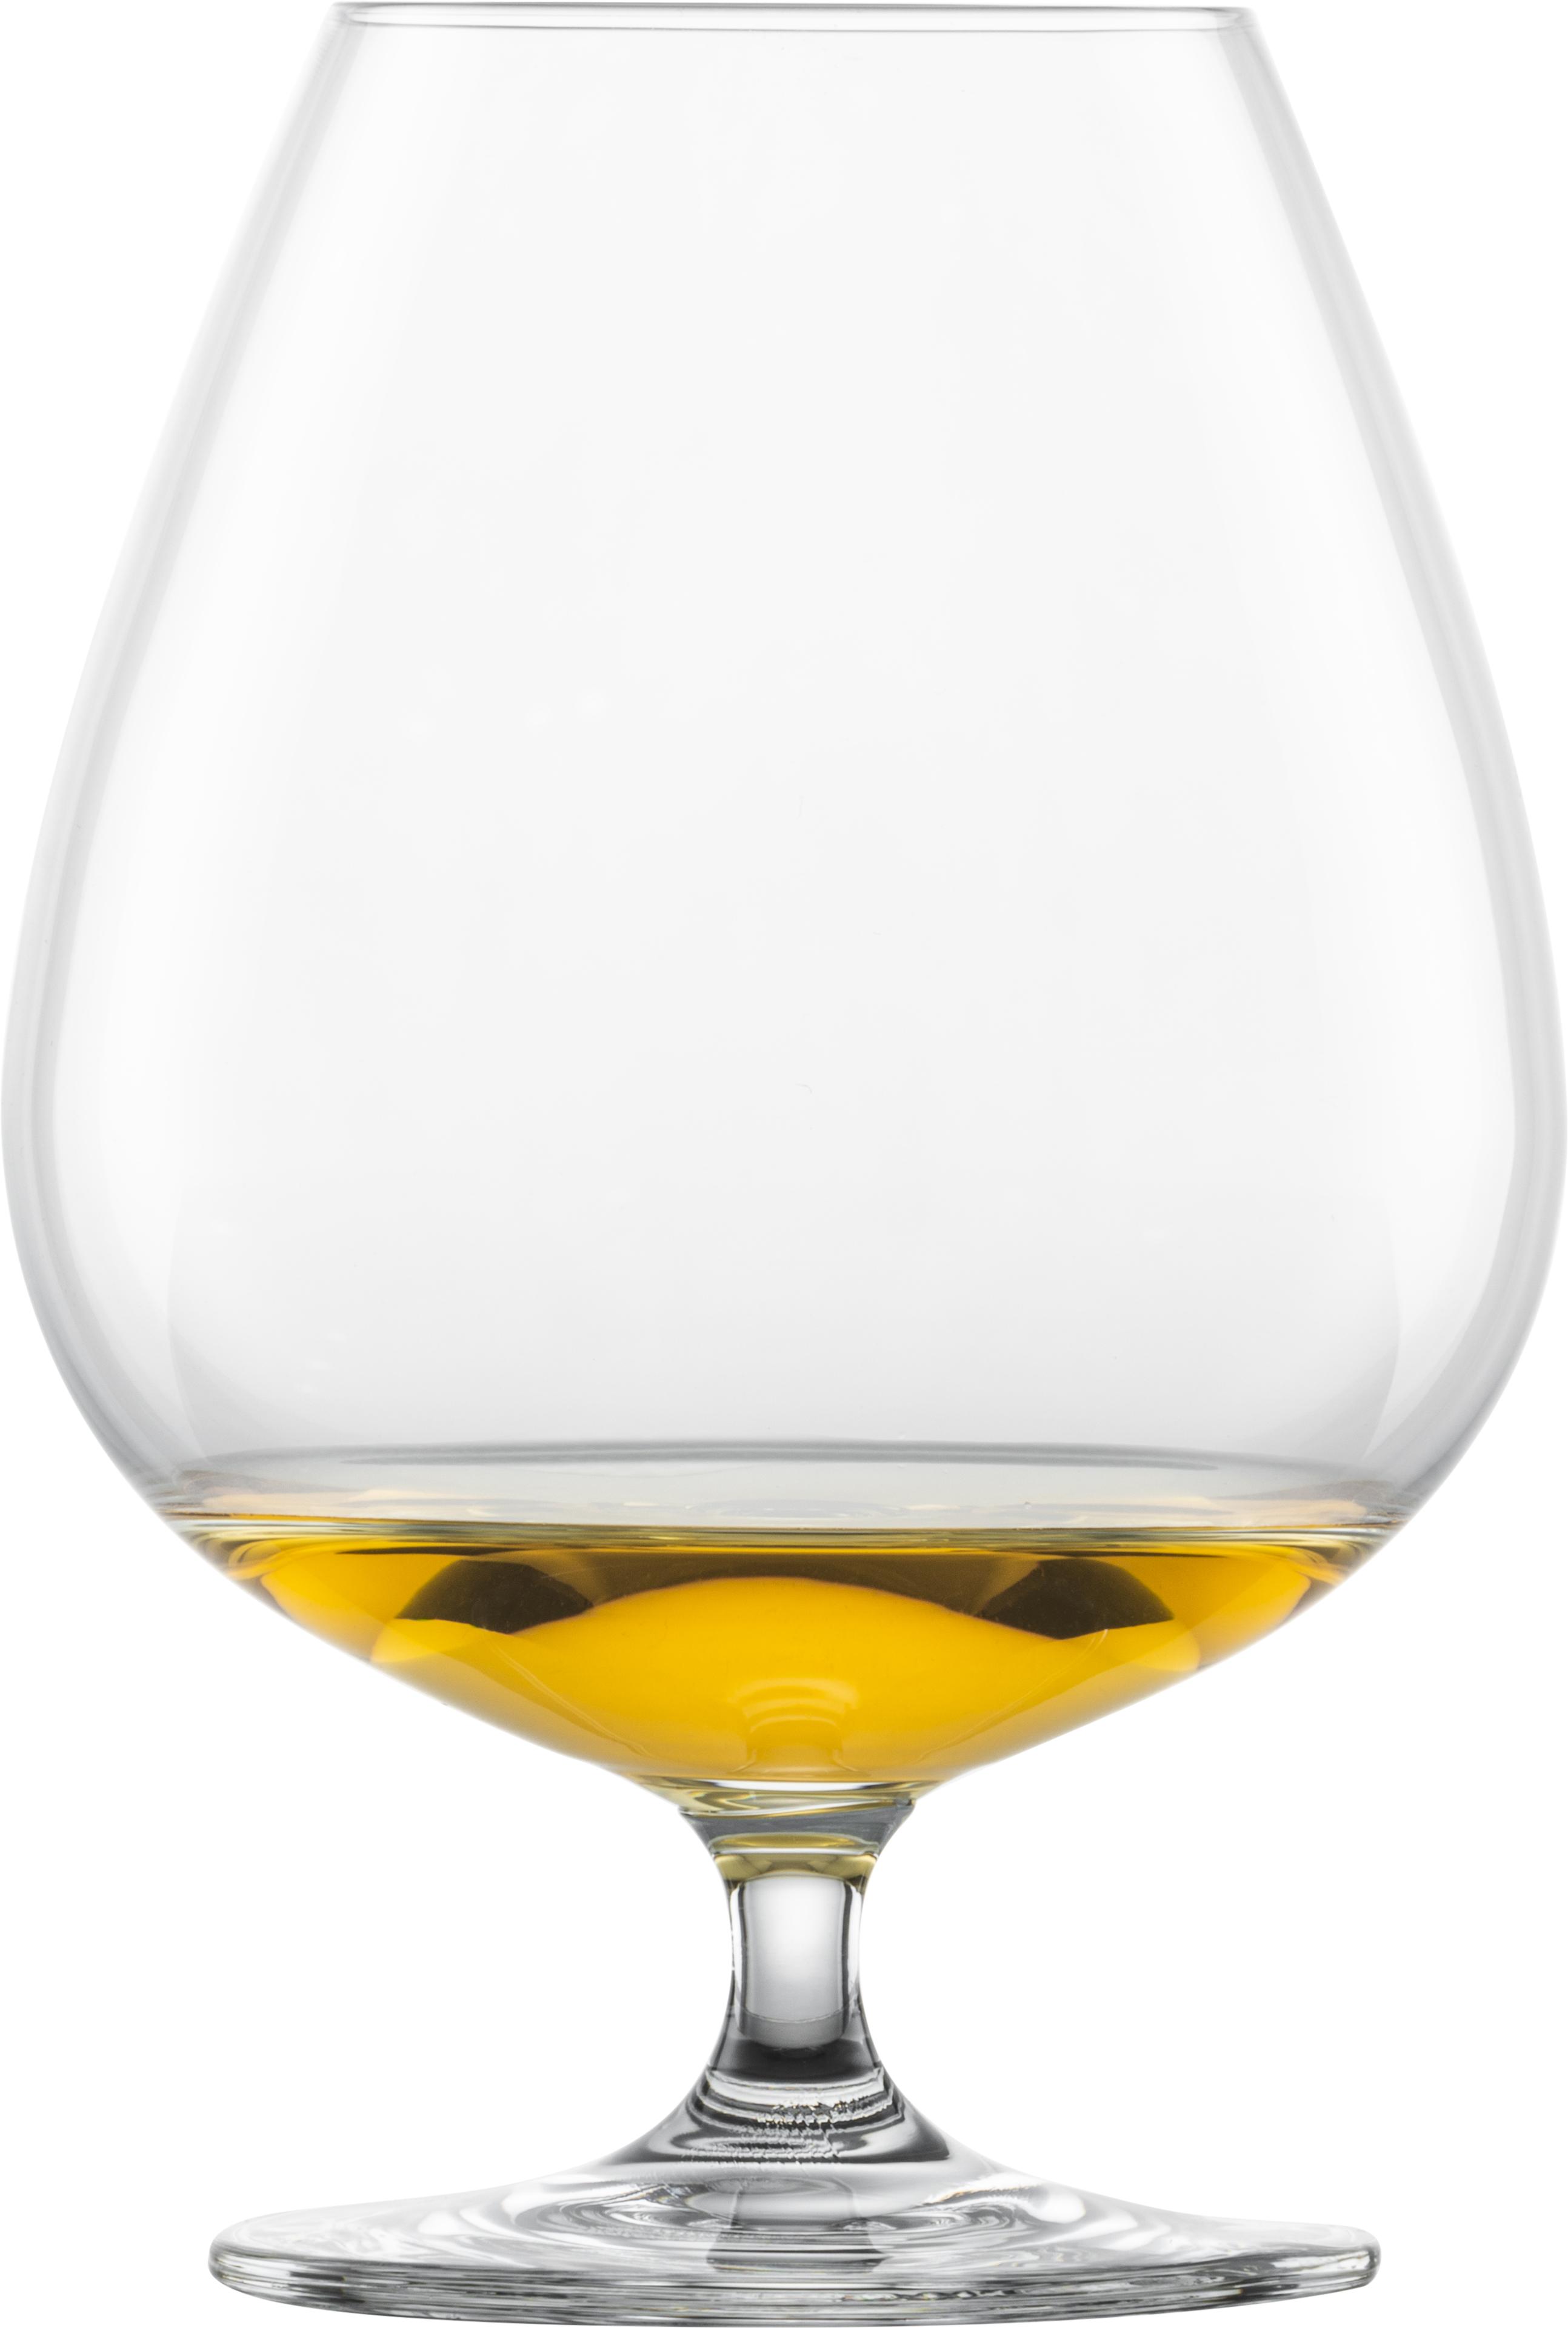 Sklenice BAR SPECIAL na Cognac XXL, 880ml, SCHOTT ZWIESEL Bal: 1ks